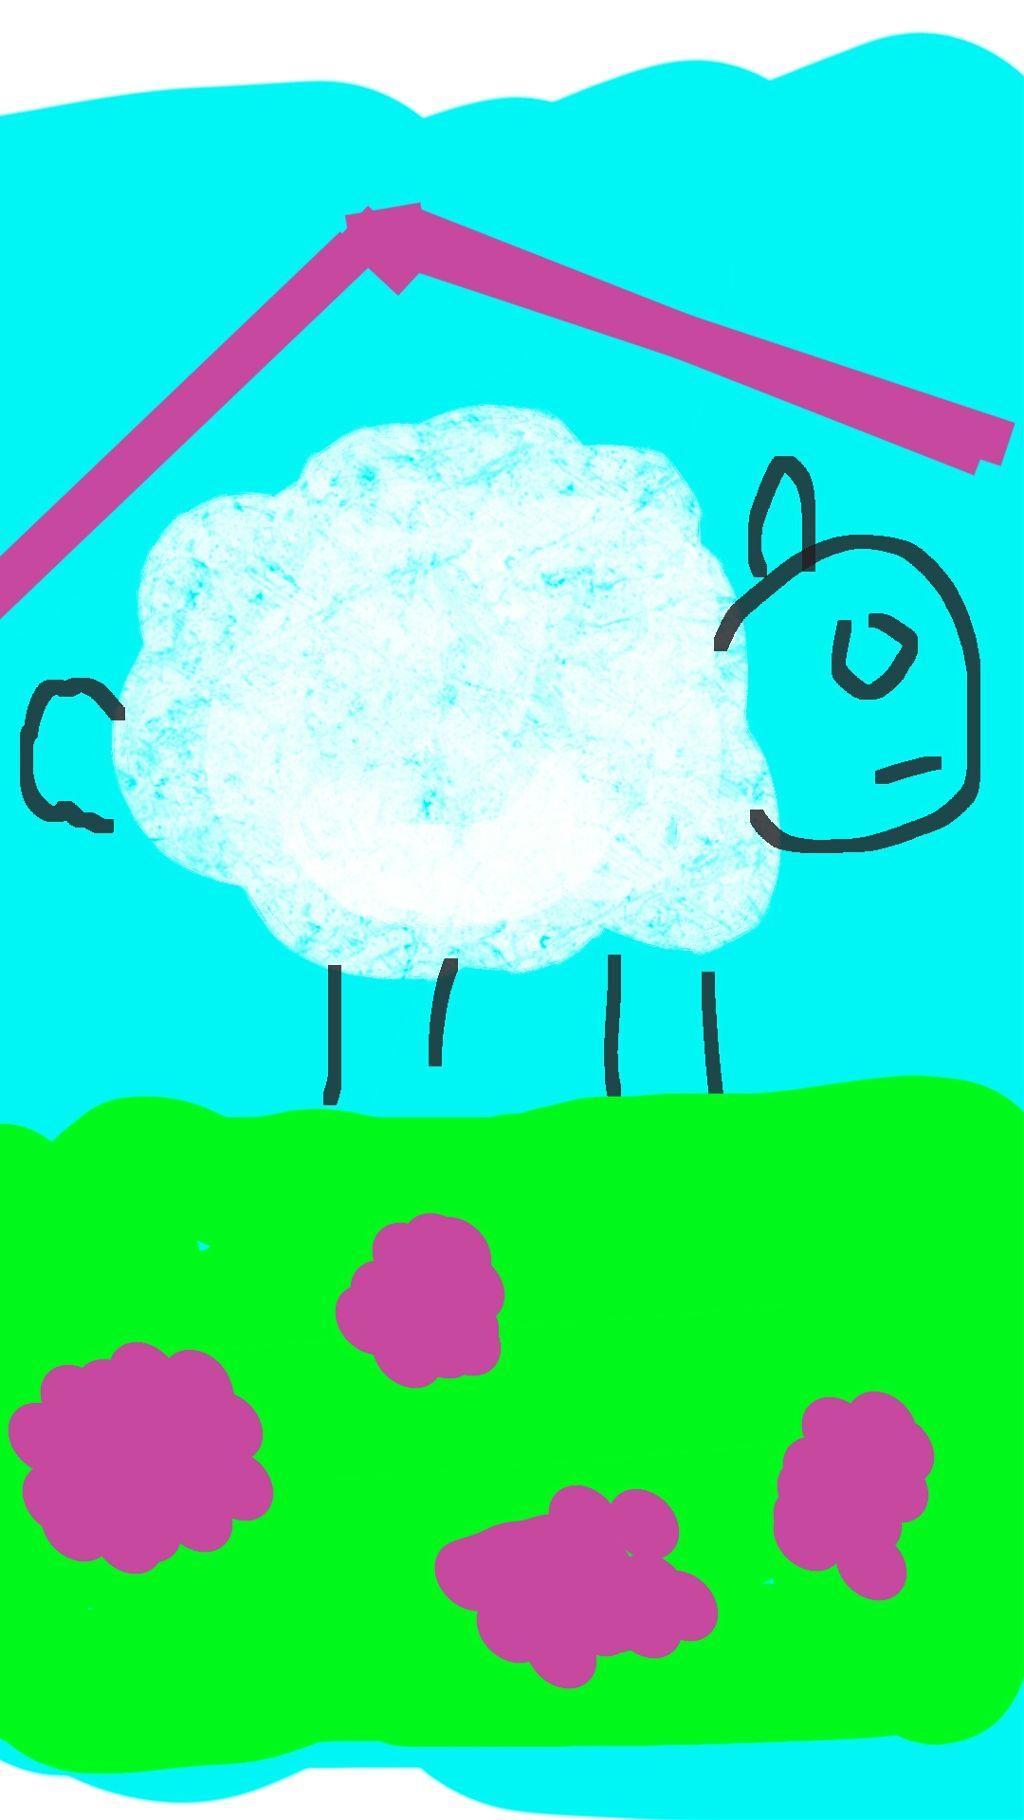 #sheep